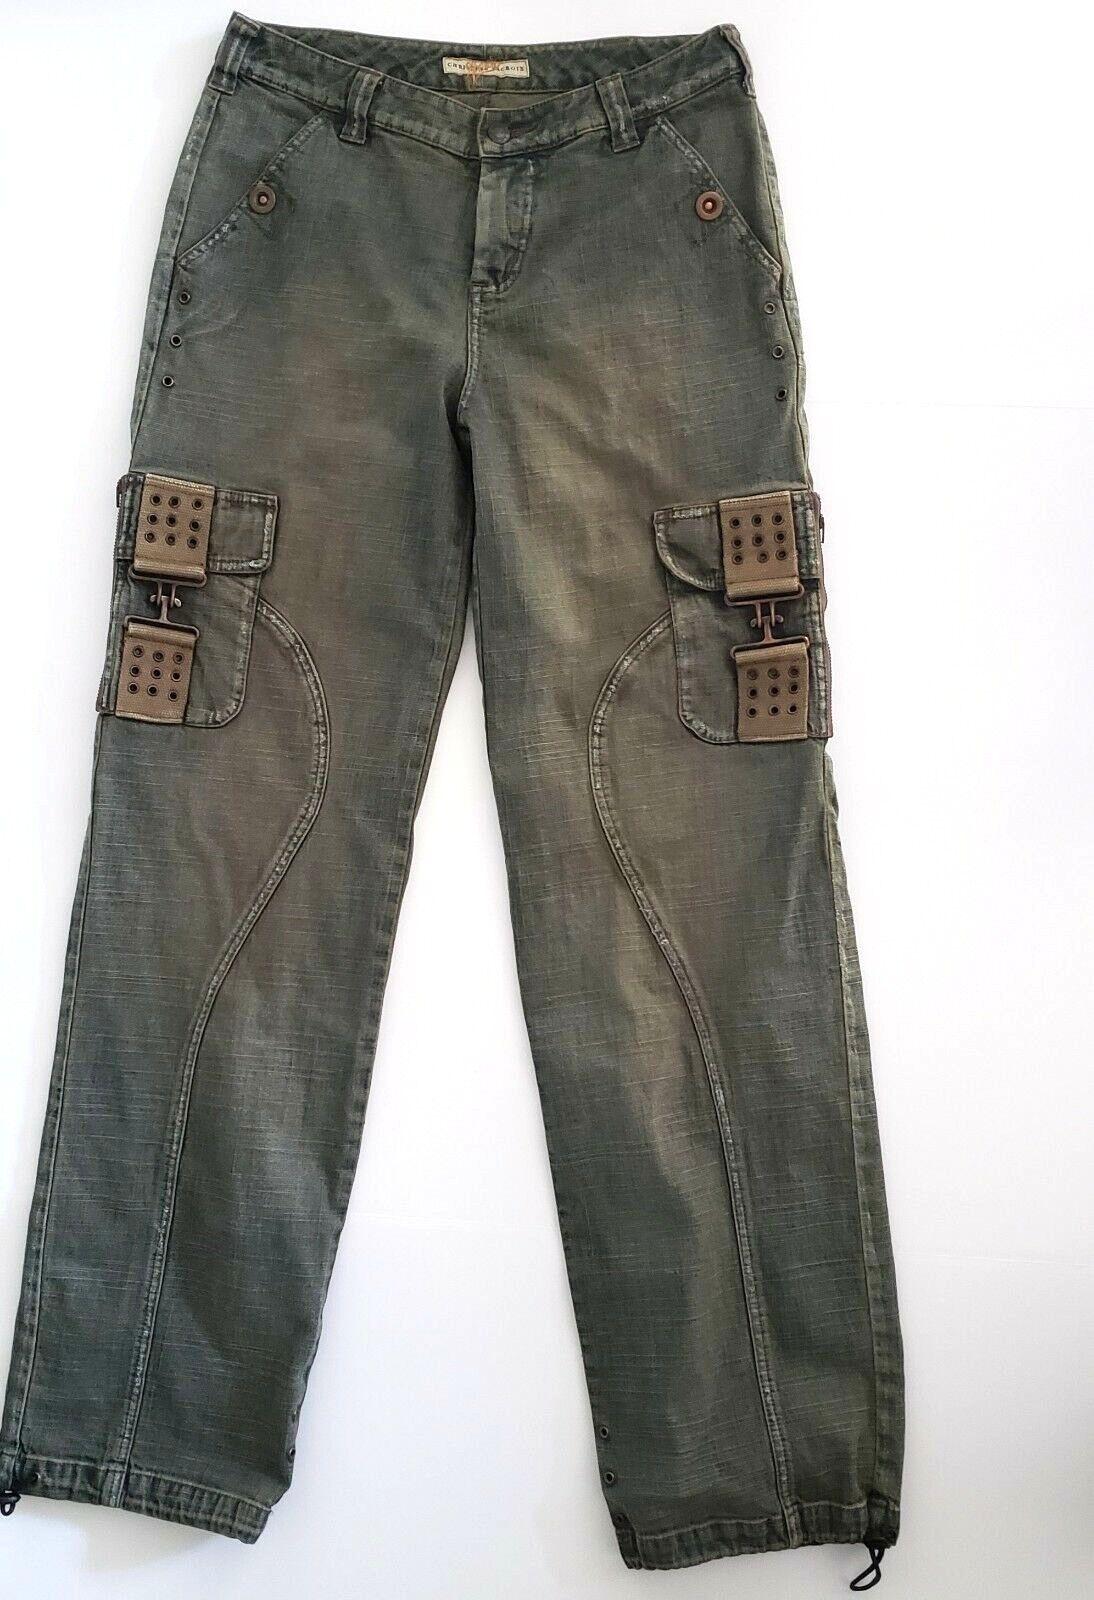 CHRISTIAN LACROIX Jeans Size 30 Womens Military Look Drawstring Cuff bluee Denim